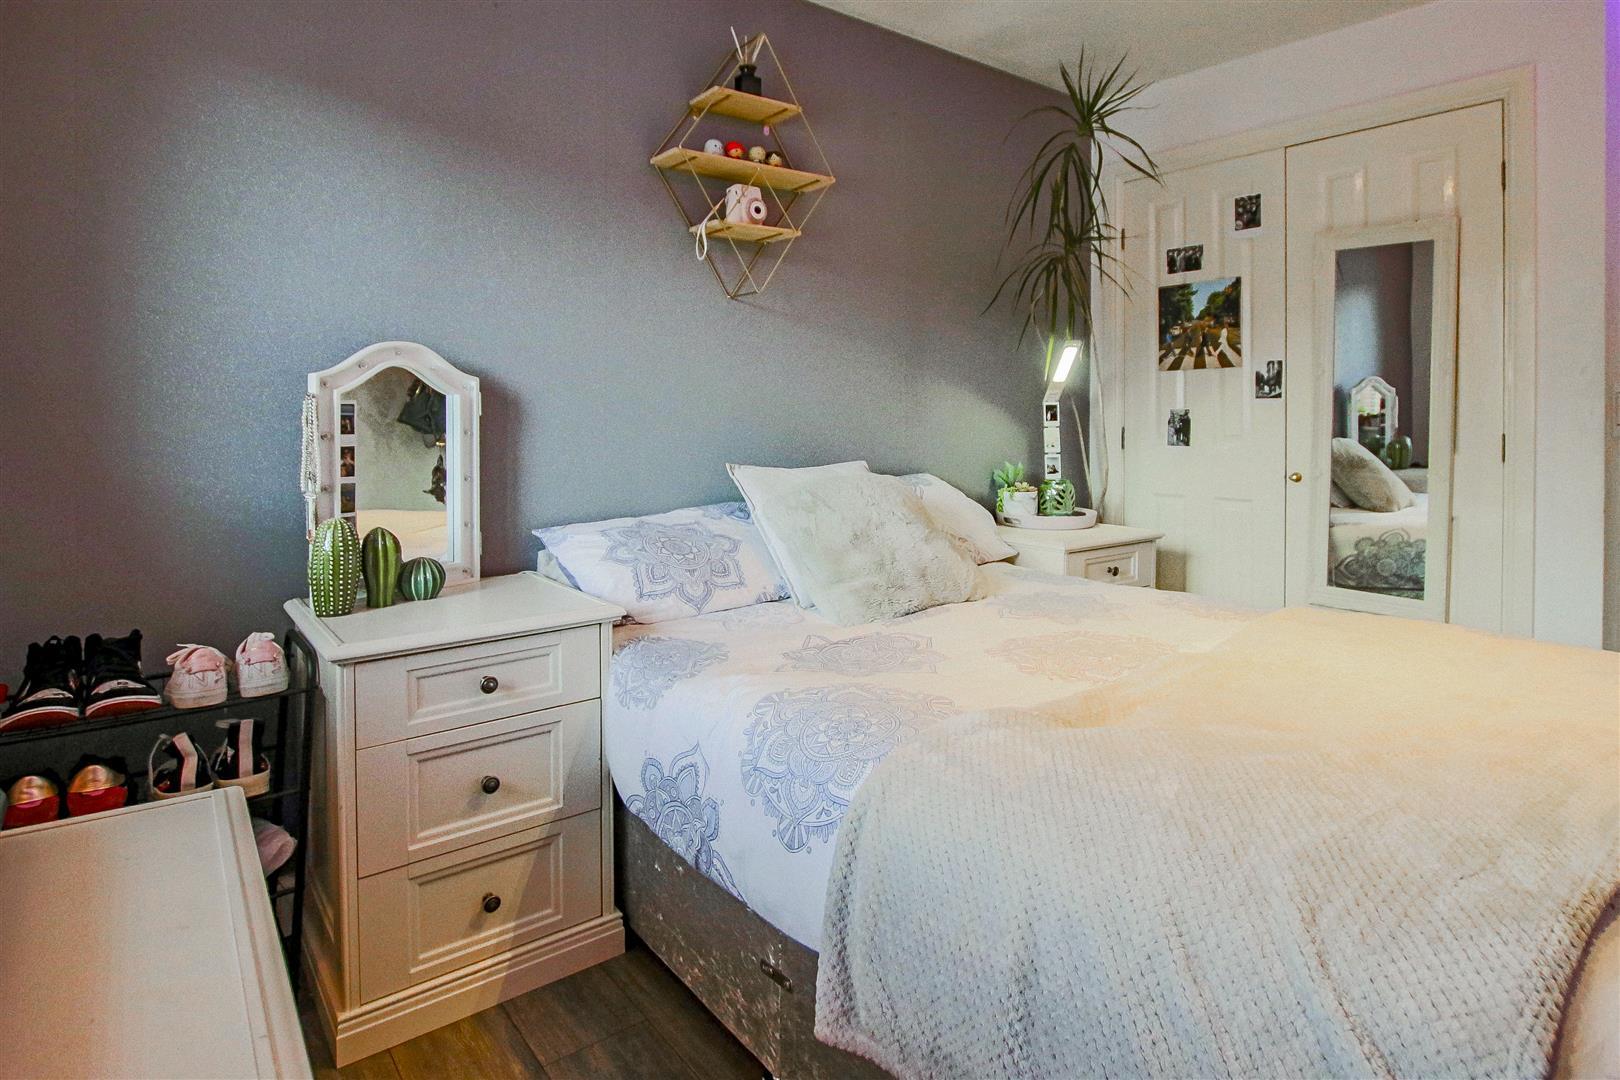 4 Bedroom Detached House For Sale - redwing31778.JPG